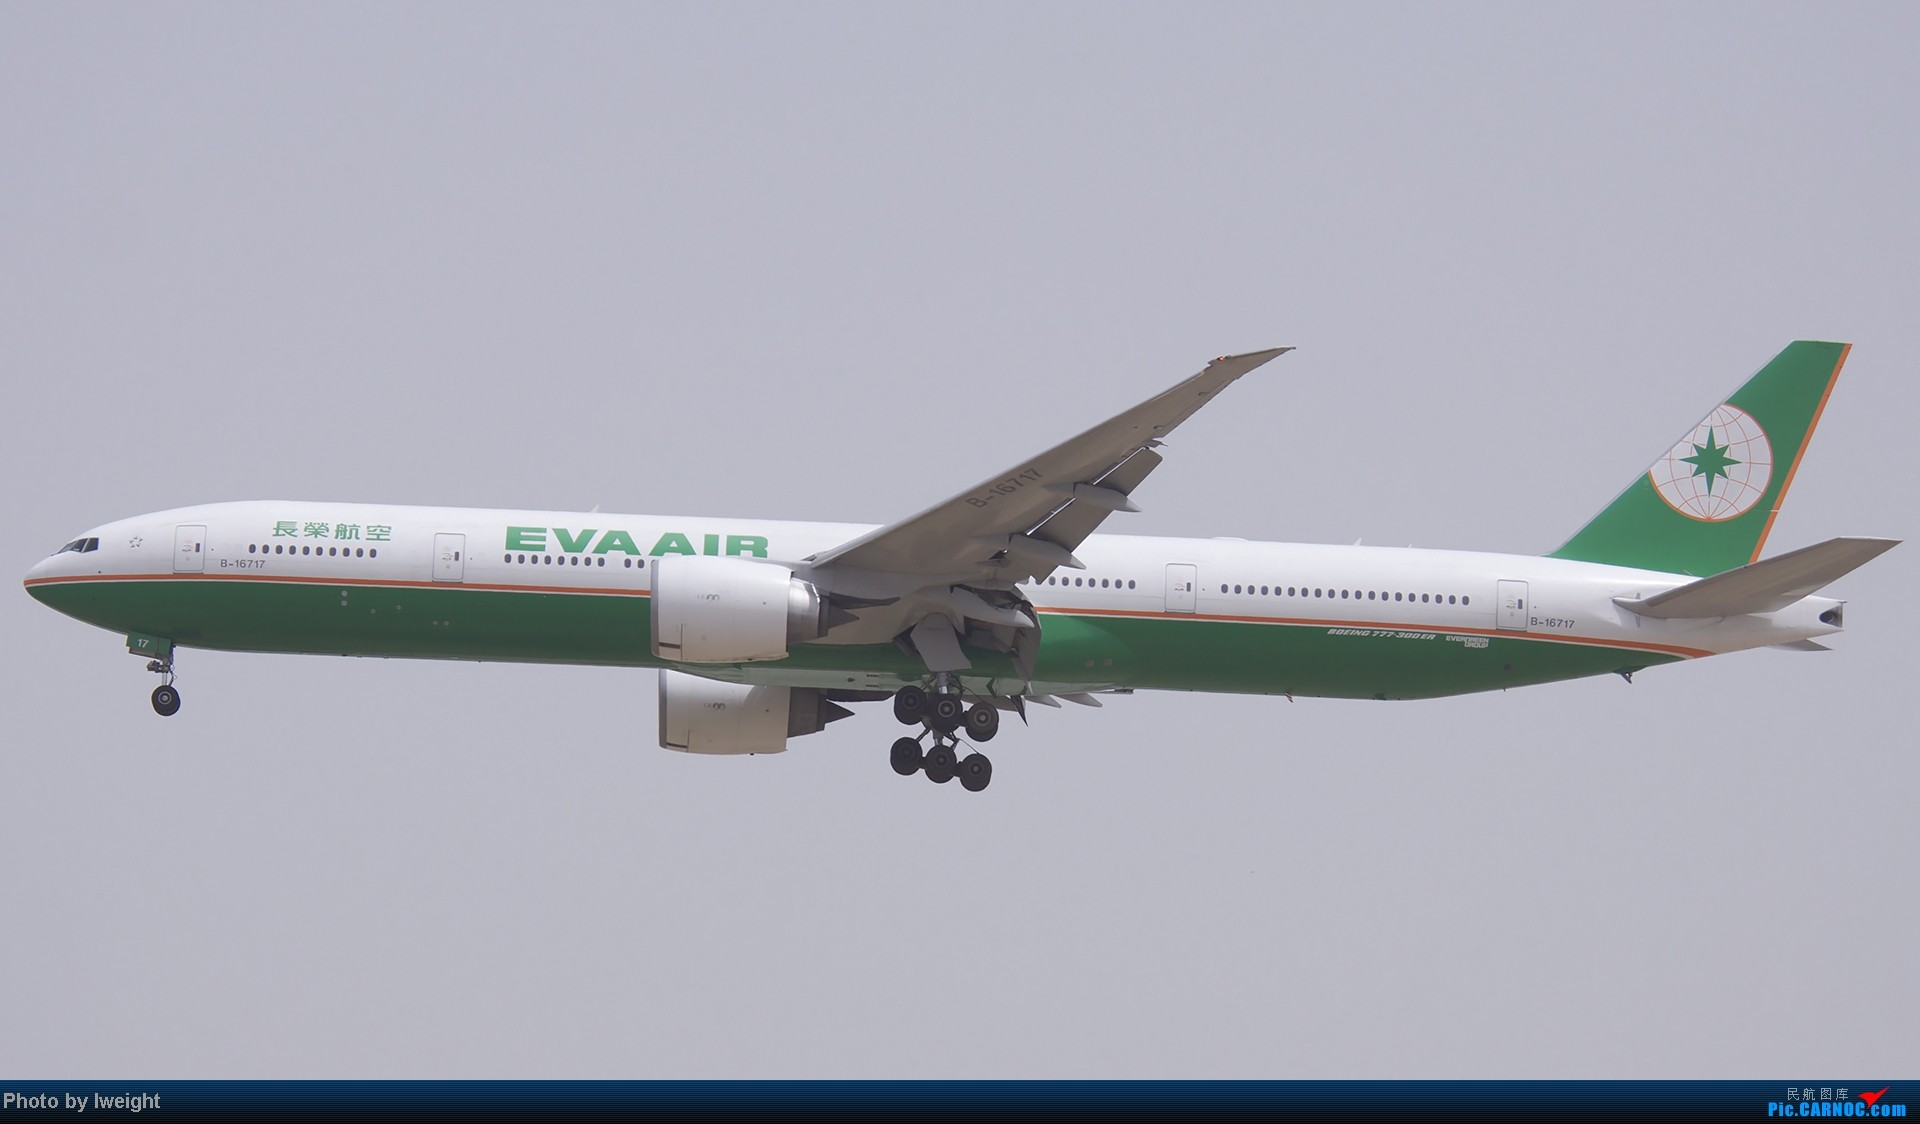 Re:[原创]霾天首都机场随拍 BOEING 777-300 B-16717 中国北京首都机场